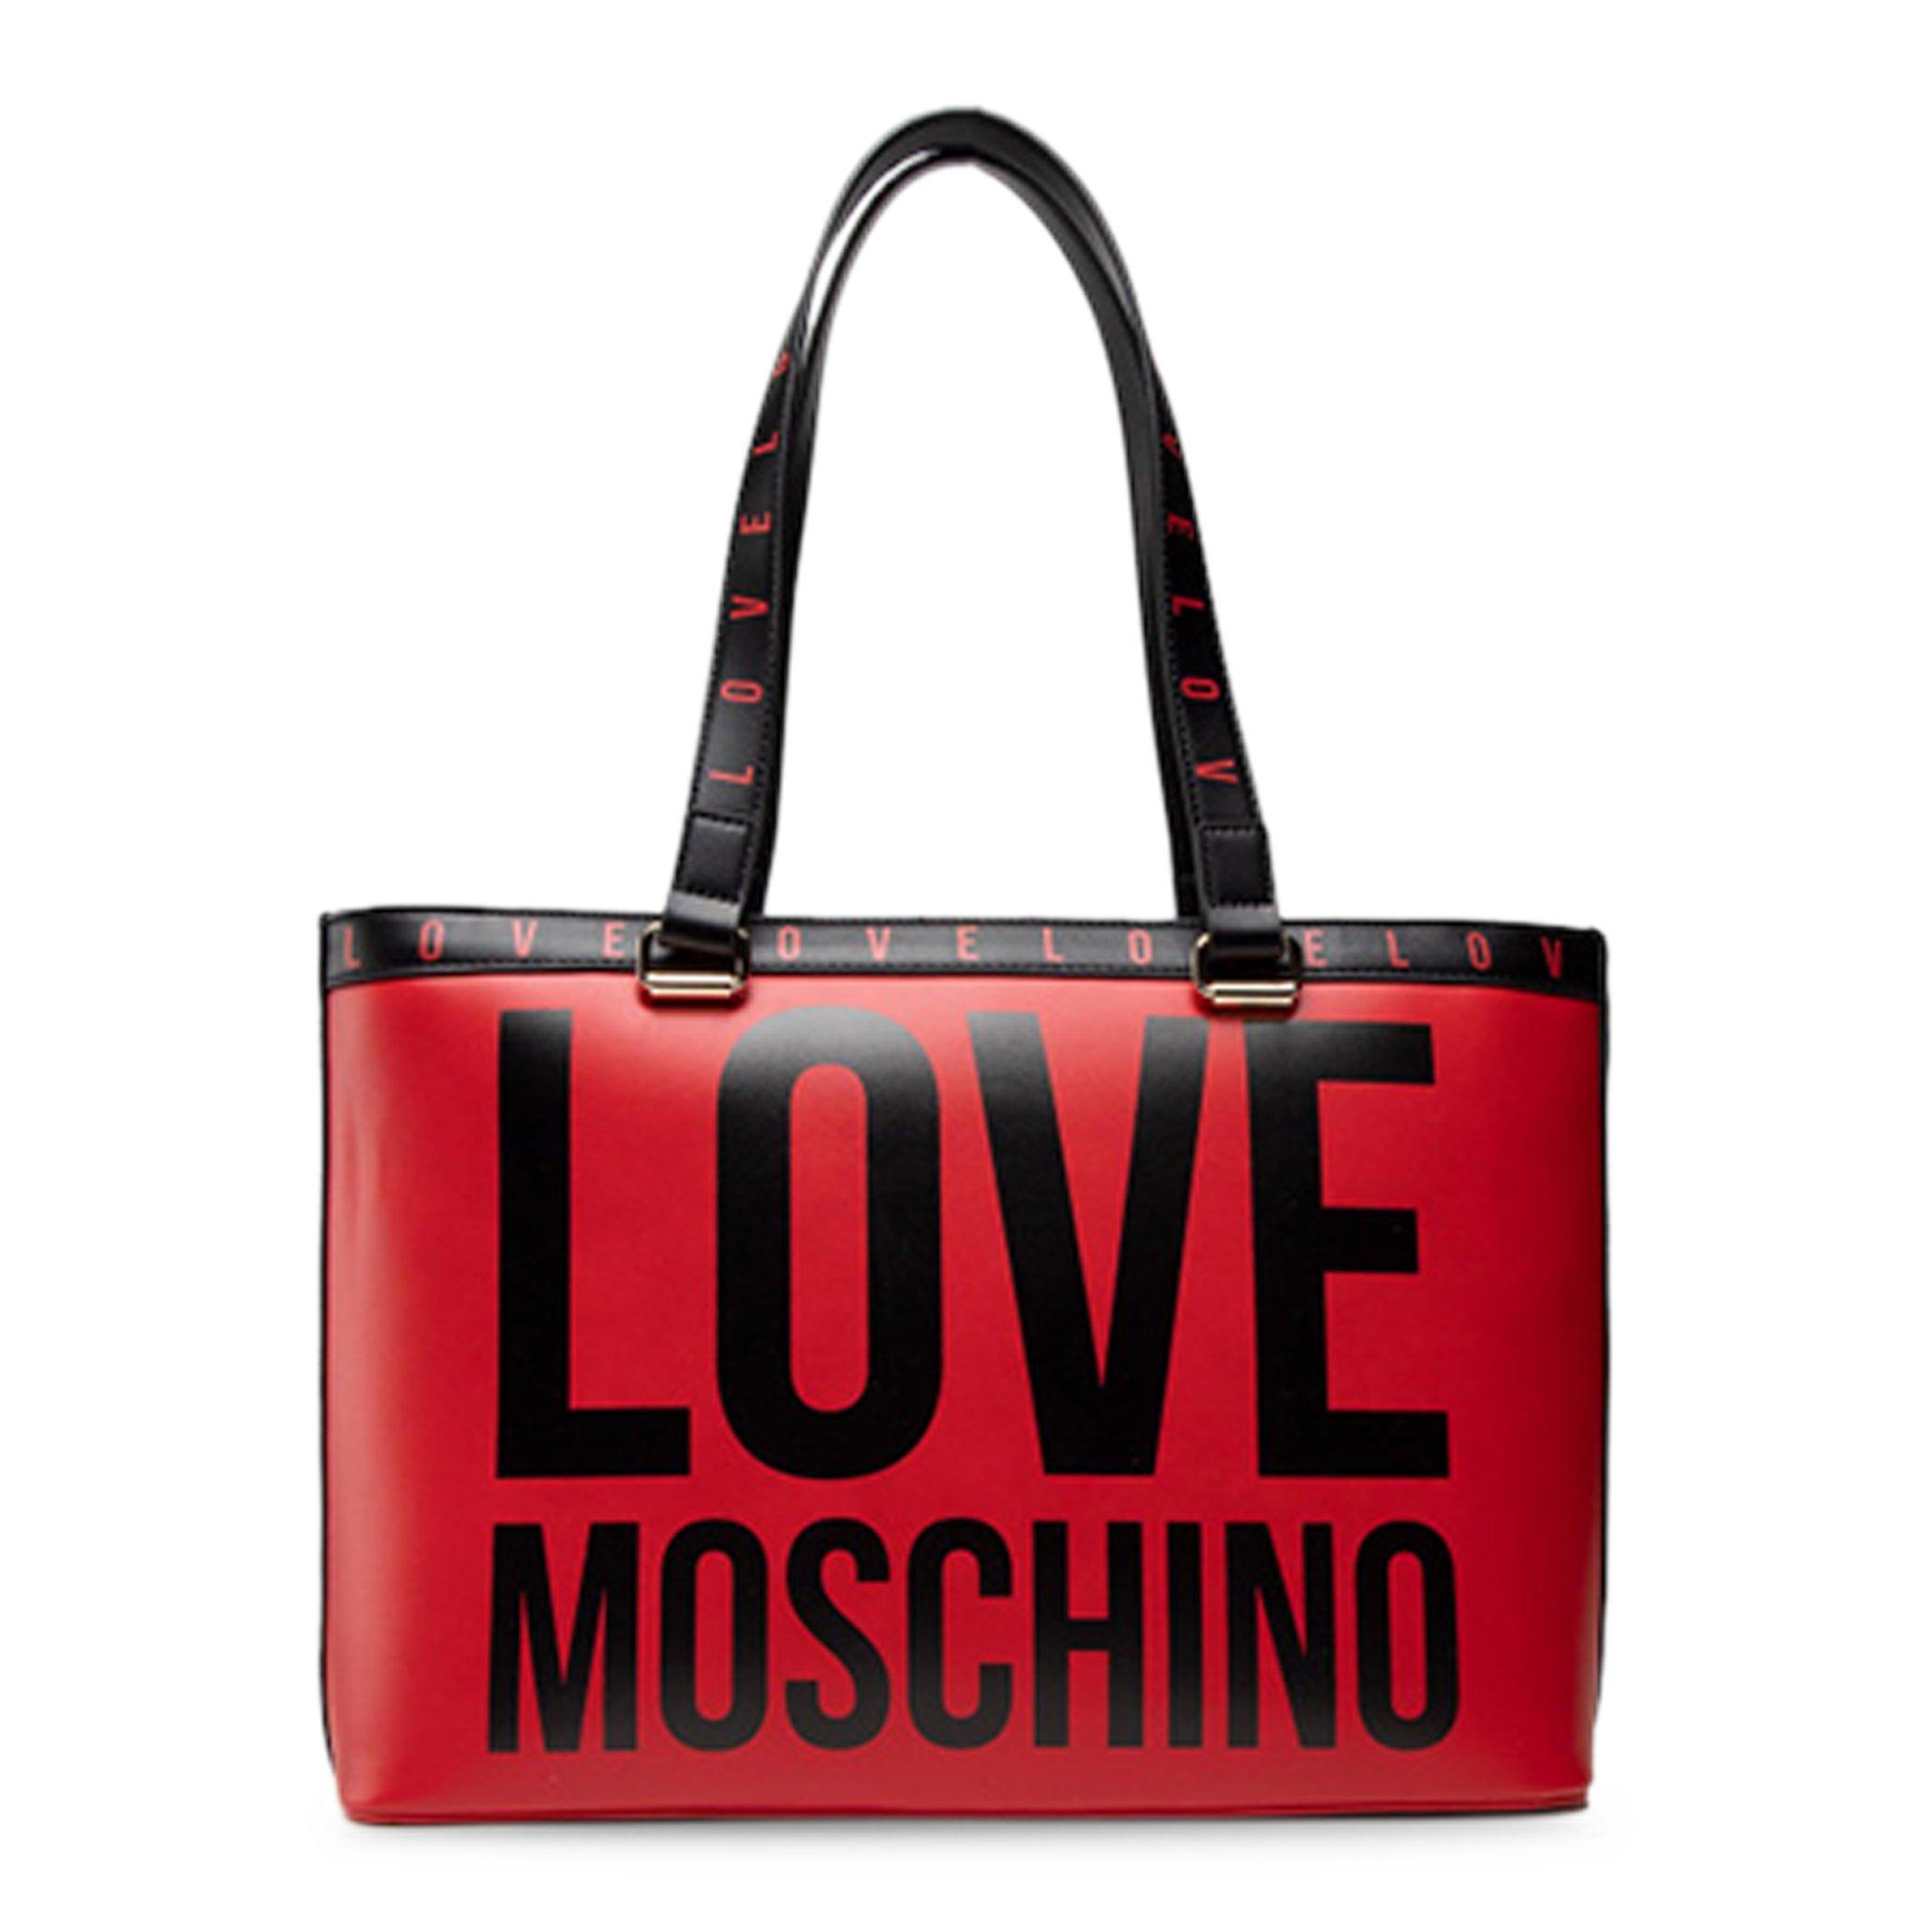 Love Moschino Women's Shopping Bag Various Colours JC4180PP1DLI0 - red NOSIZE